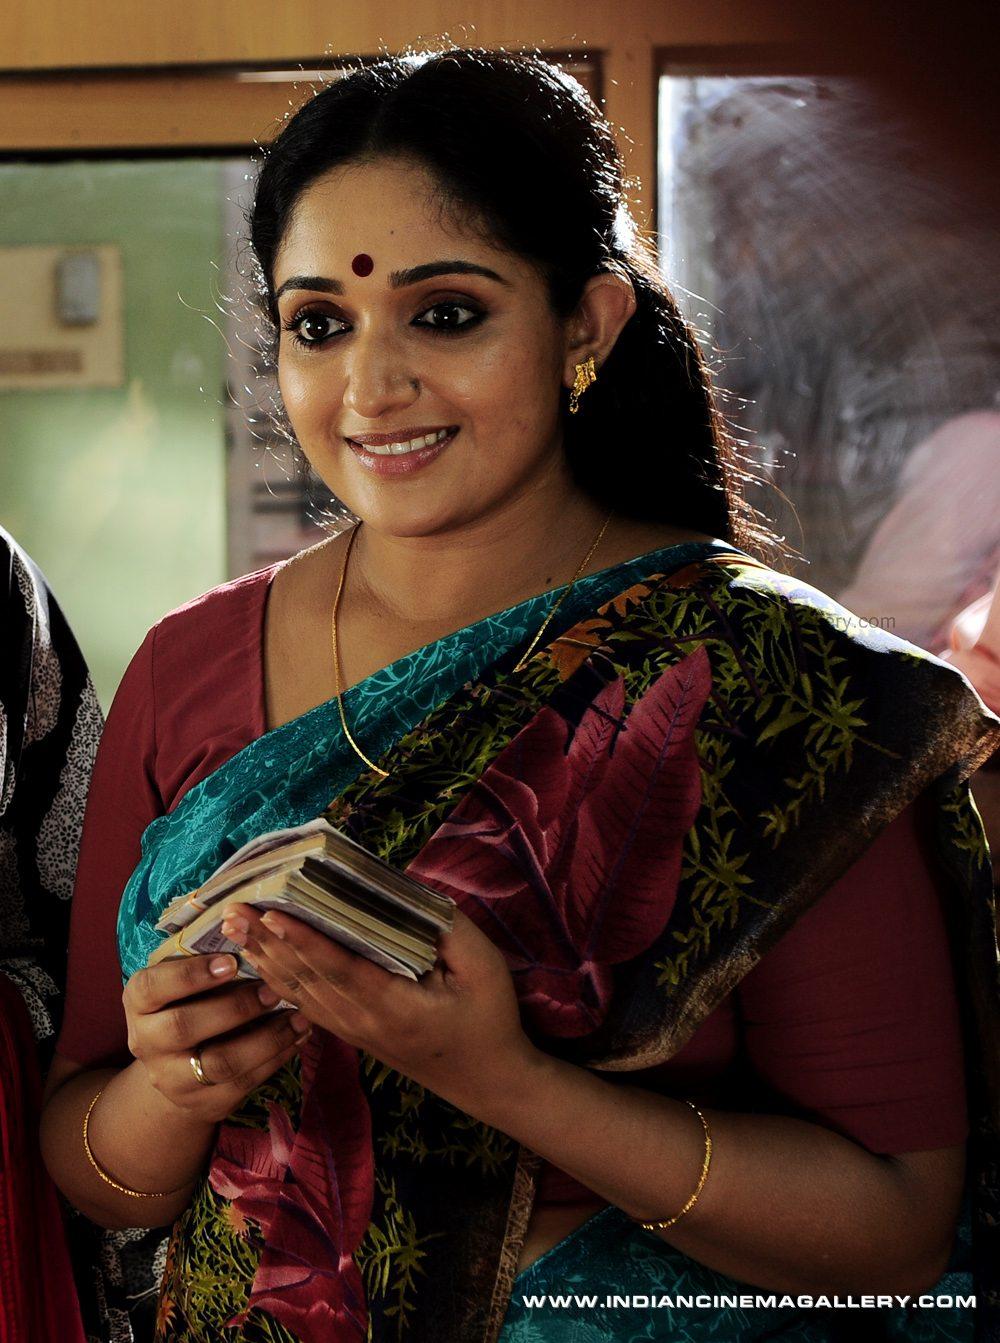 SouthIndian Actress Gallery: KAVYA MADHAVAN HOT